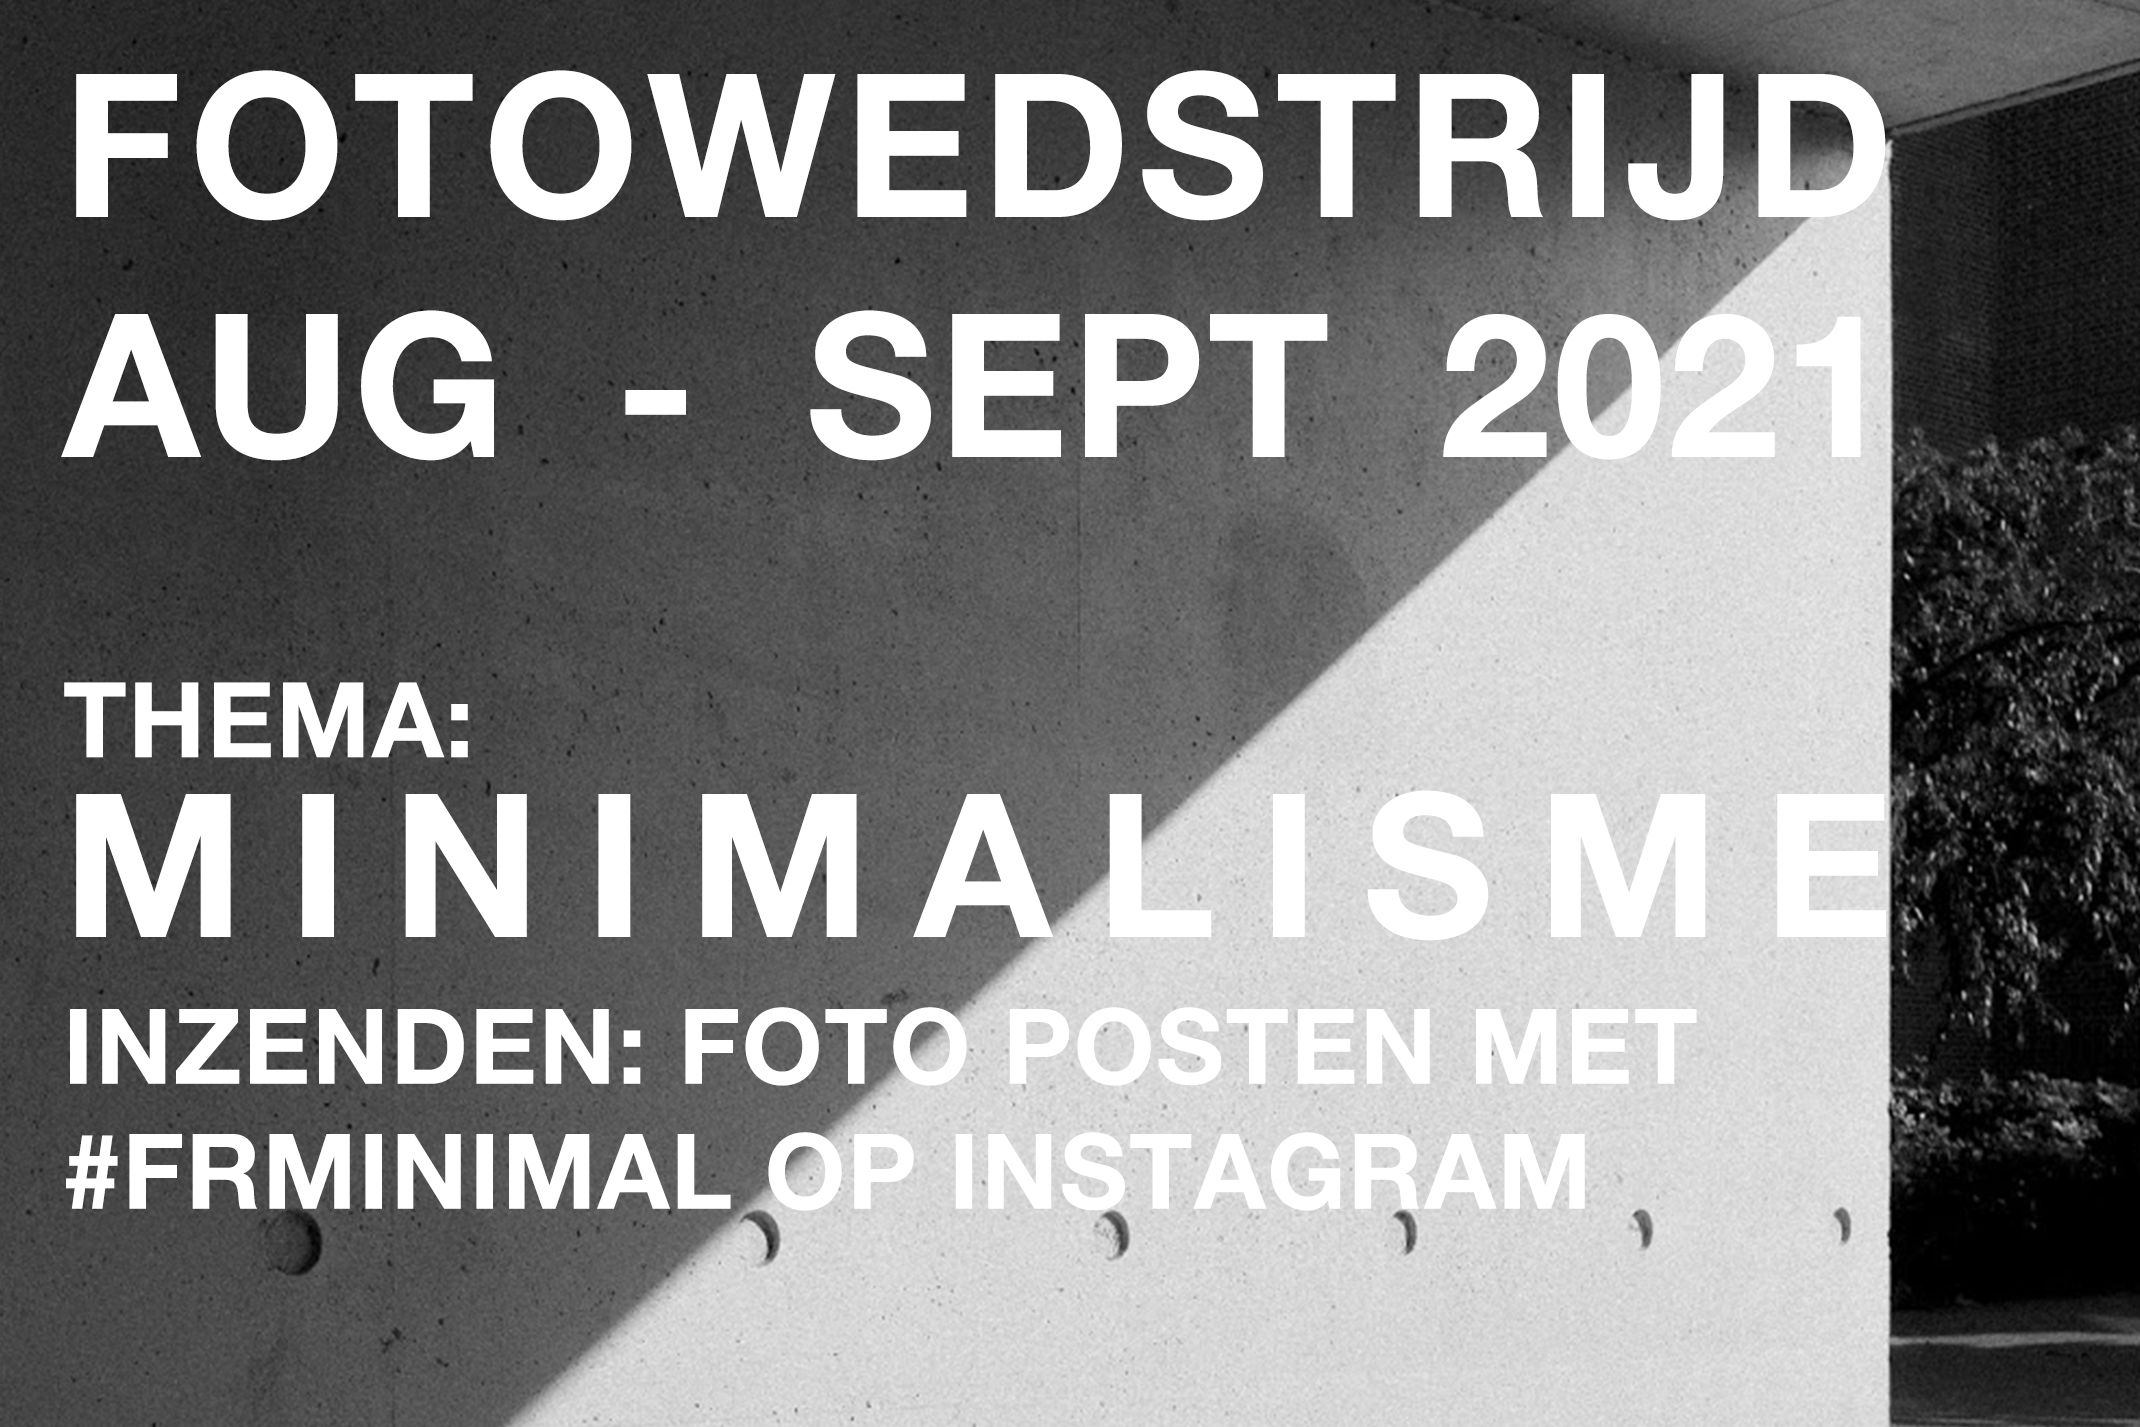 Fotowedstrijd Minimalisme